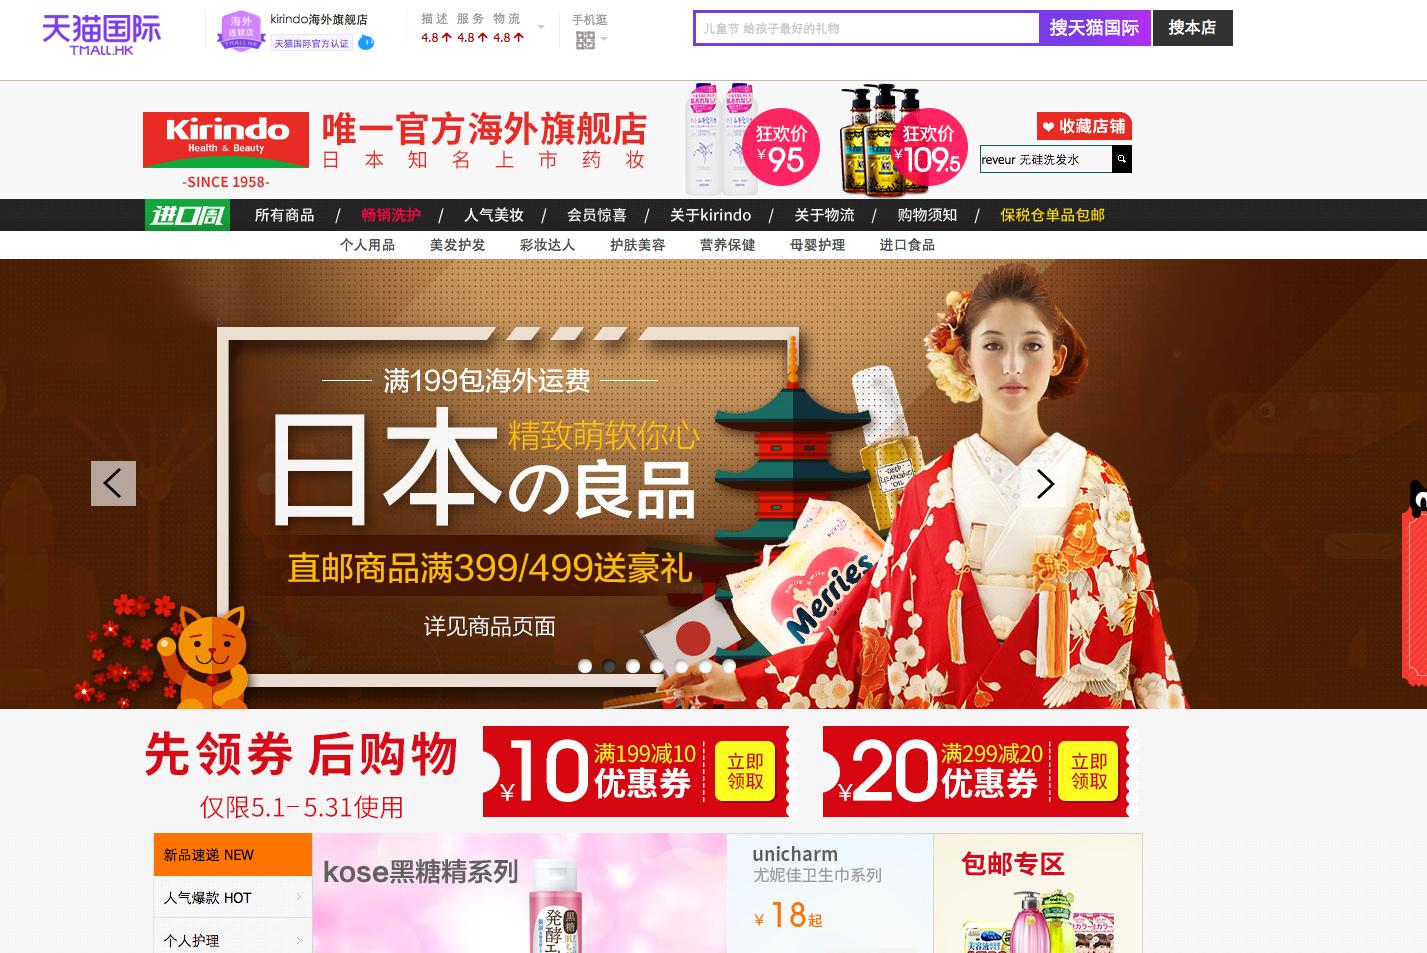 Japan brand China eCommerce